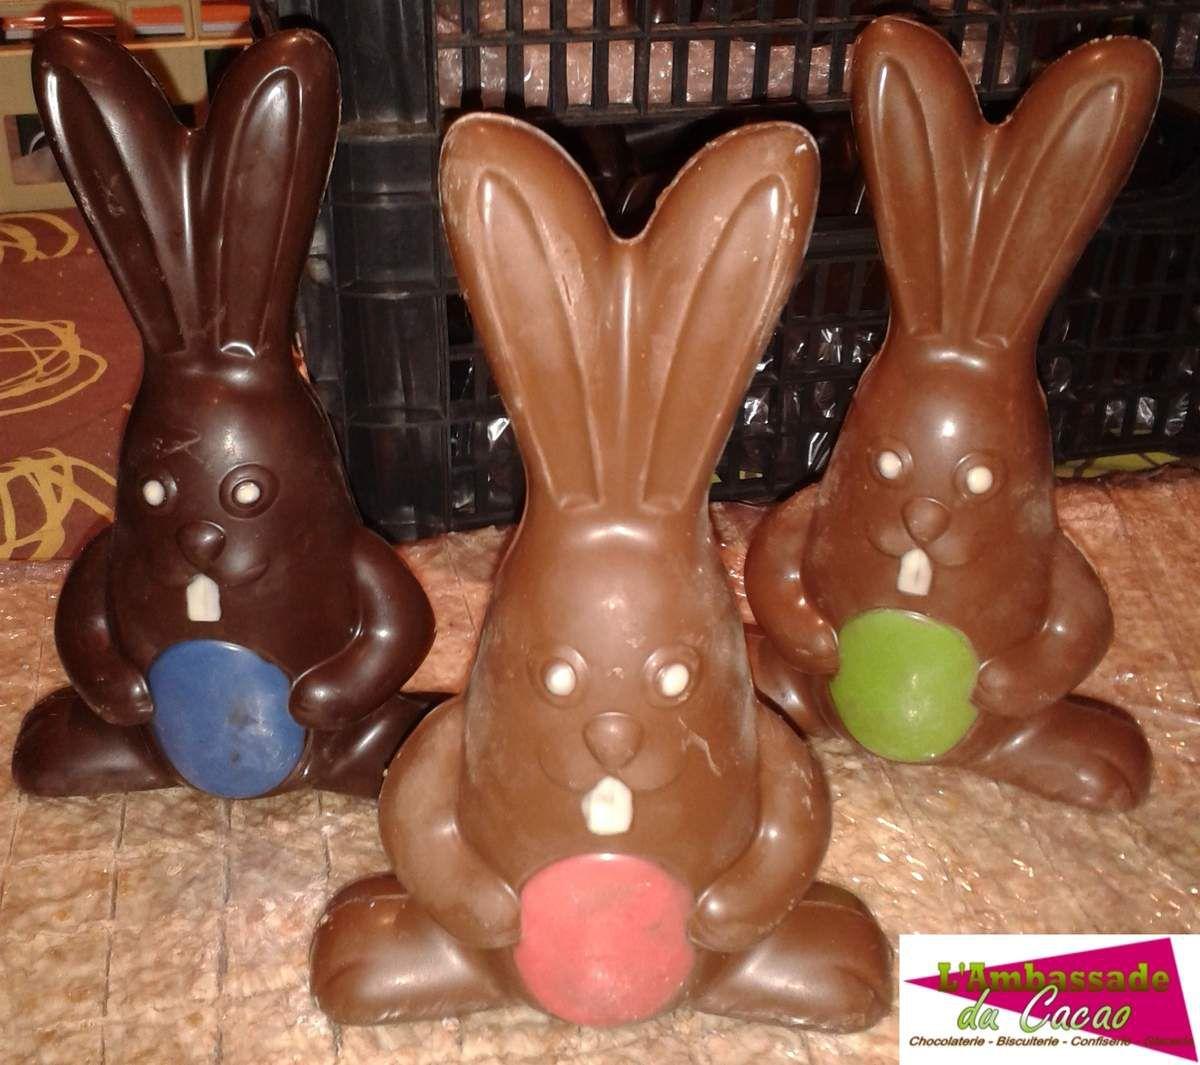 Tombola des Lapins en Chocolat 2016